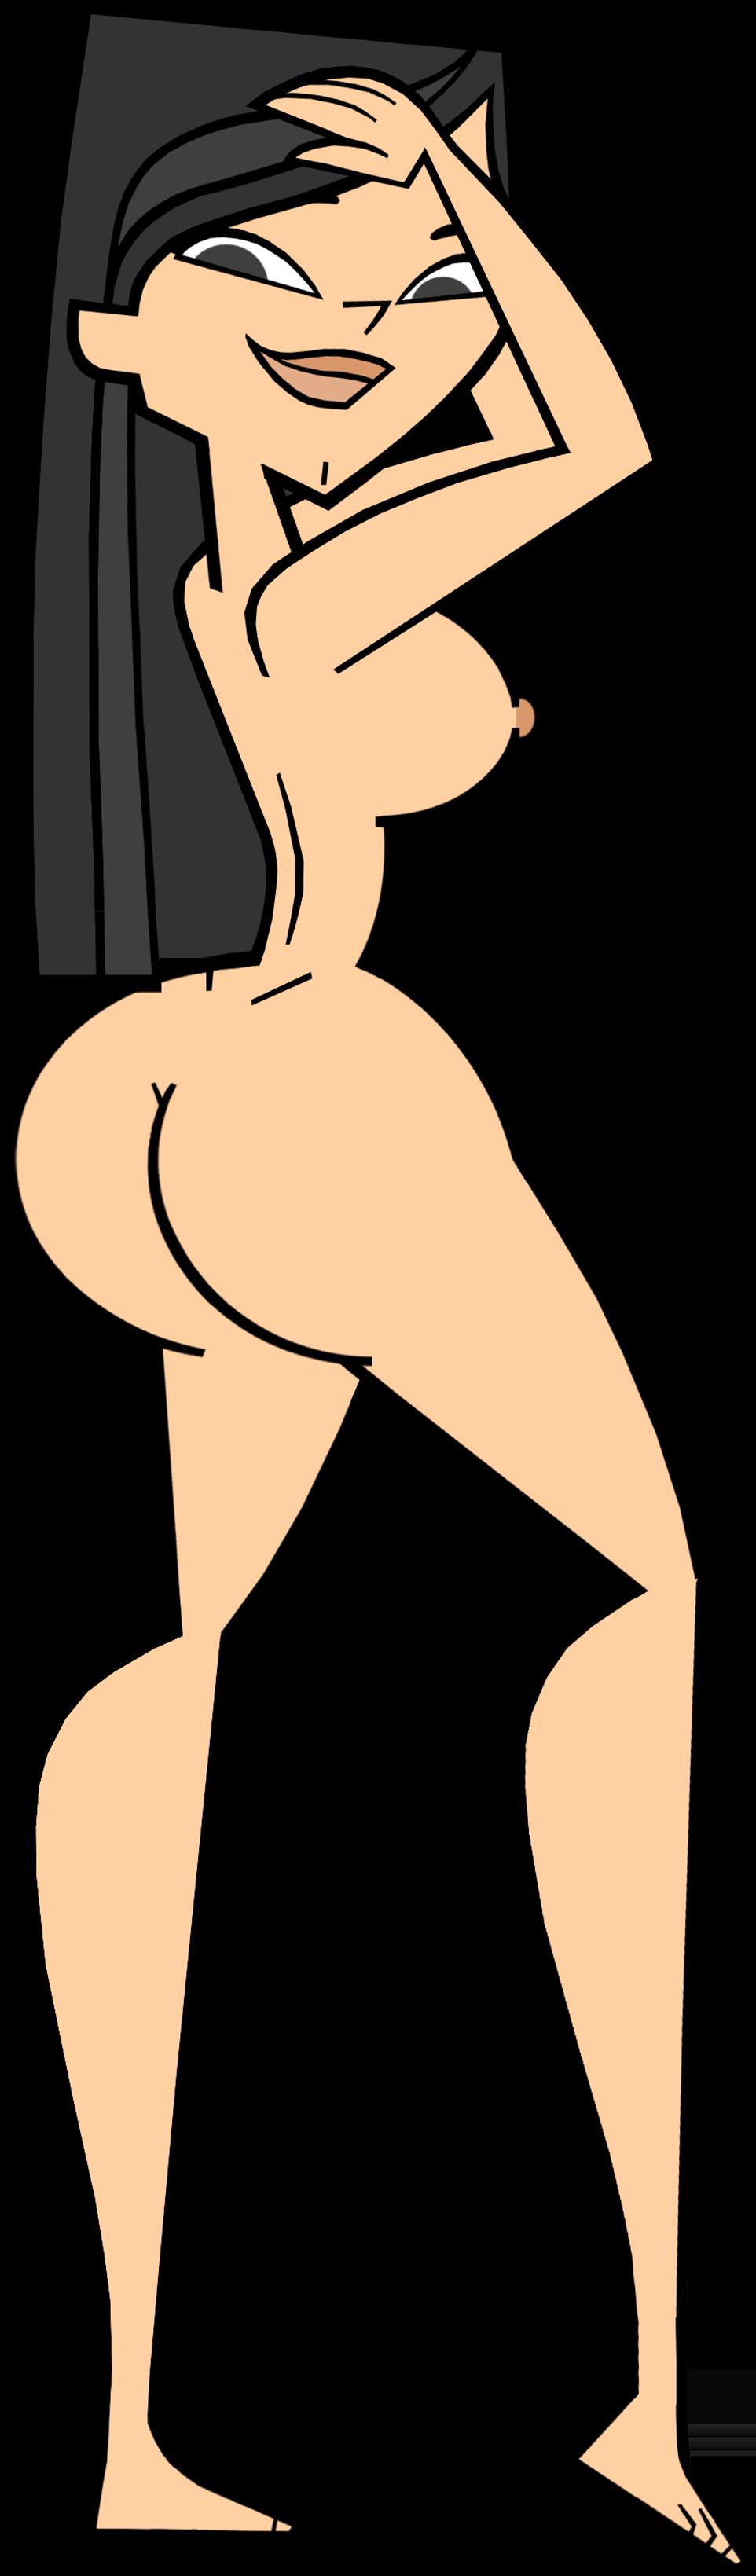 Total drama island naked females